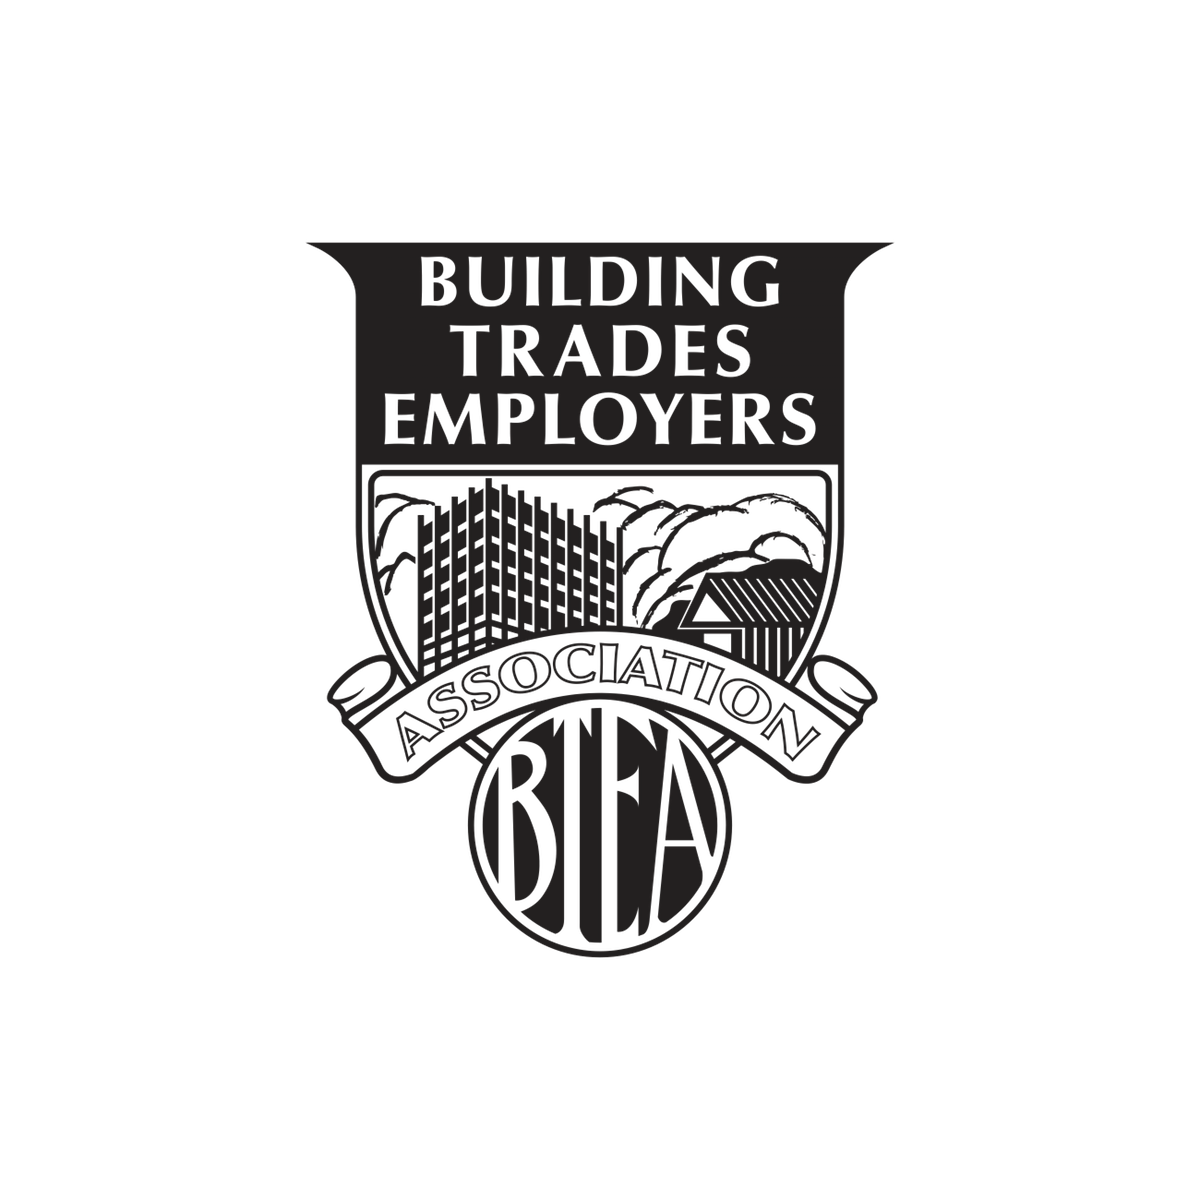 Take latest refurbished logo and change wording